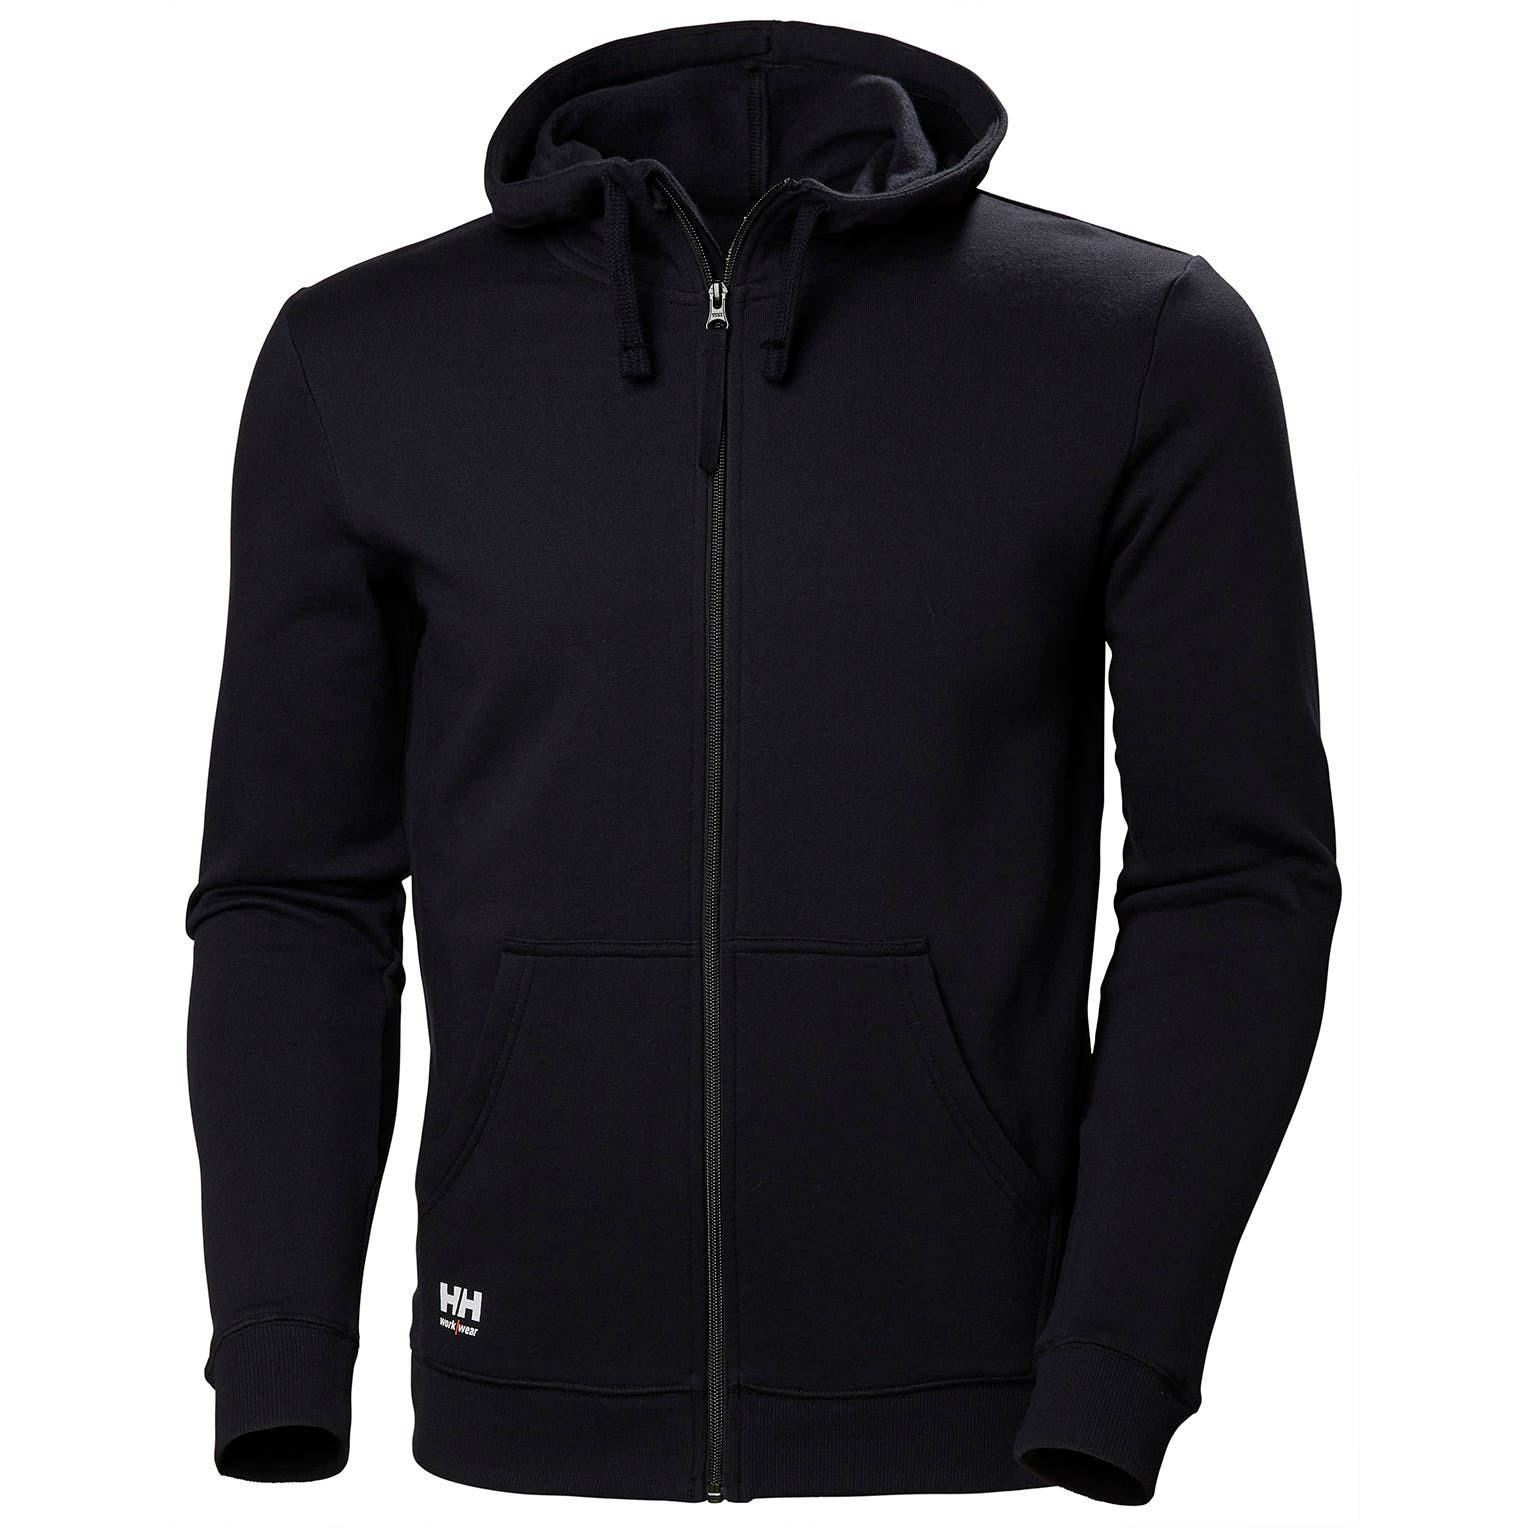 Худи на молнии Helly Hansen Manchester Zip Hoodie - 79216 (Black; XL)